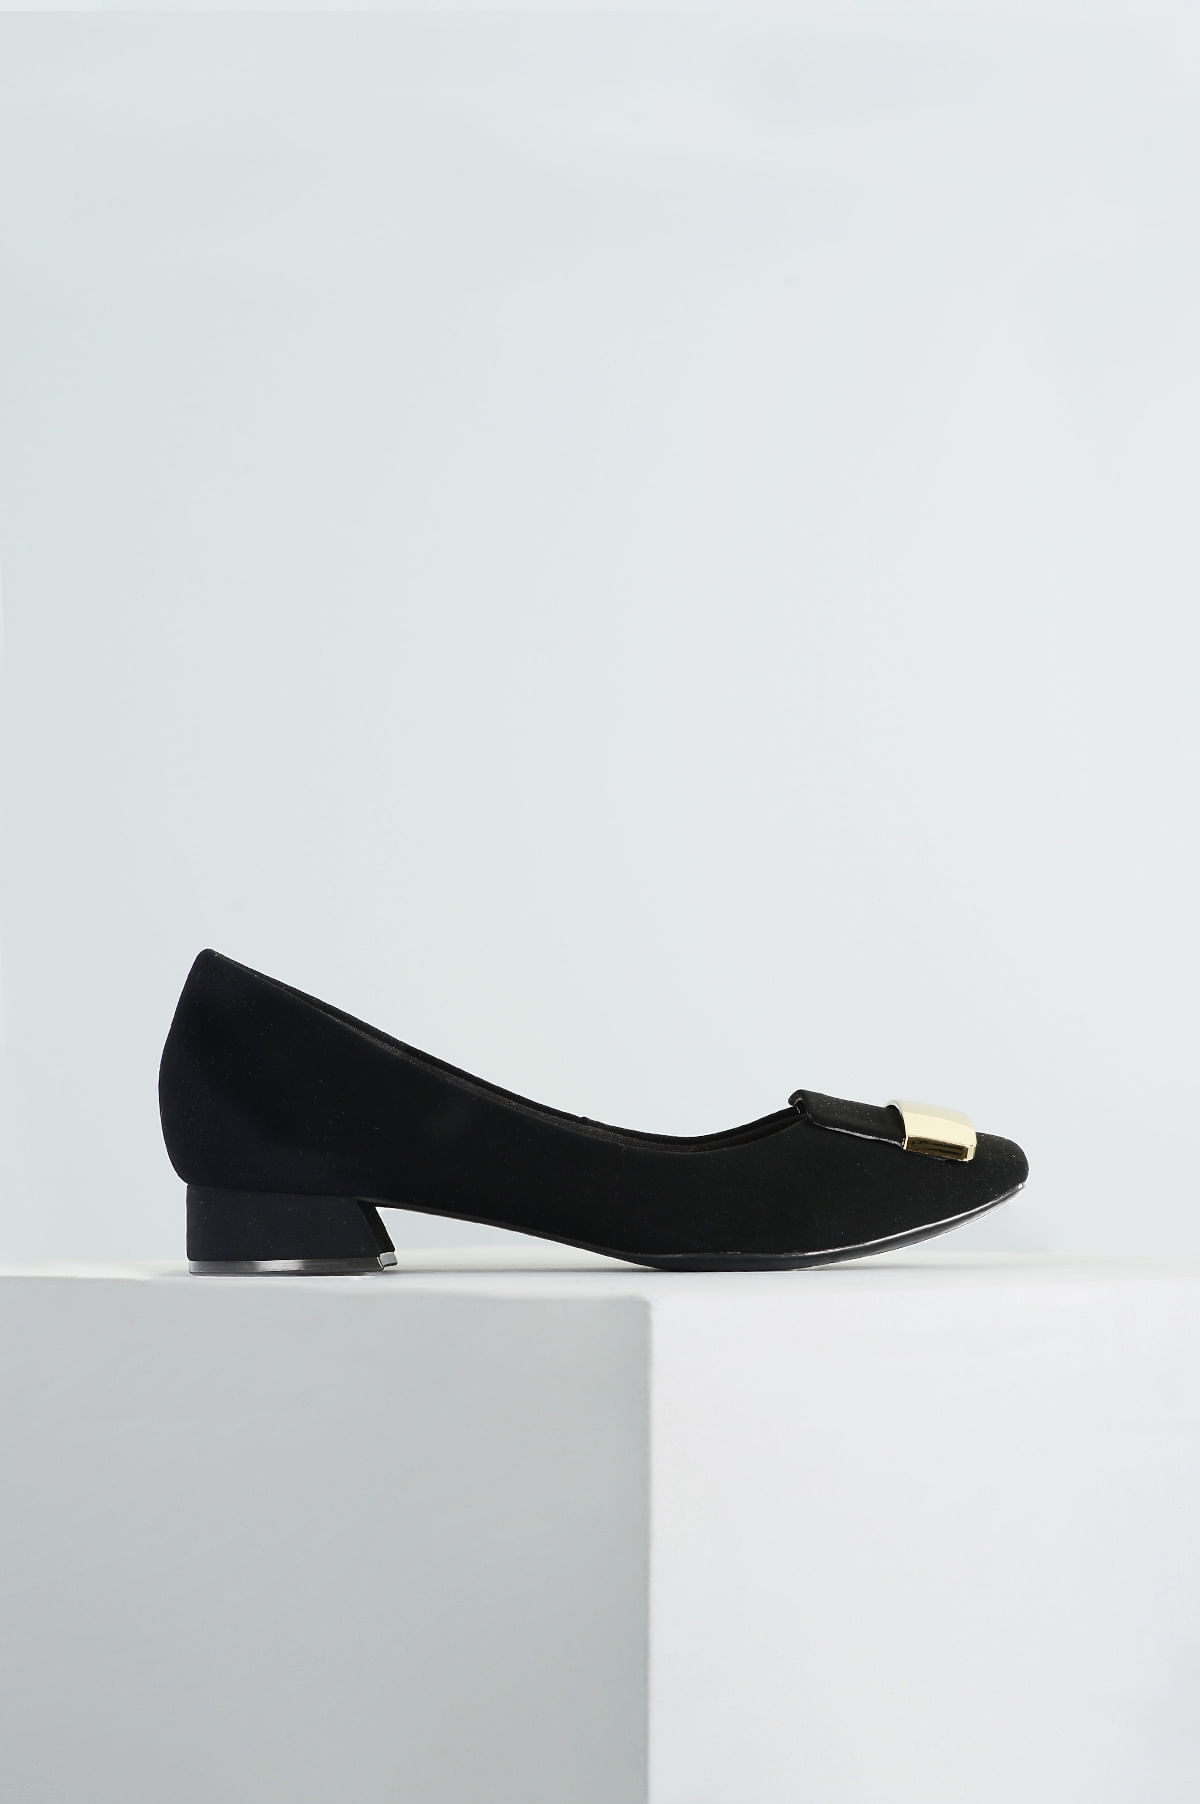 23c5b15523 Sapato Feminino Salto Baixo Bethy Mundial NB - PRETO - Mundial Calçados